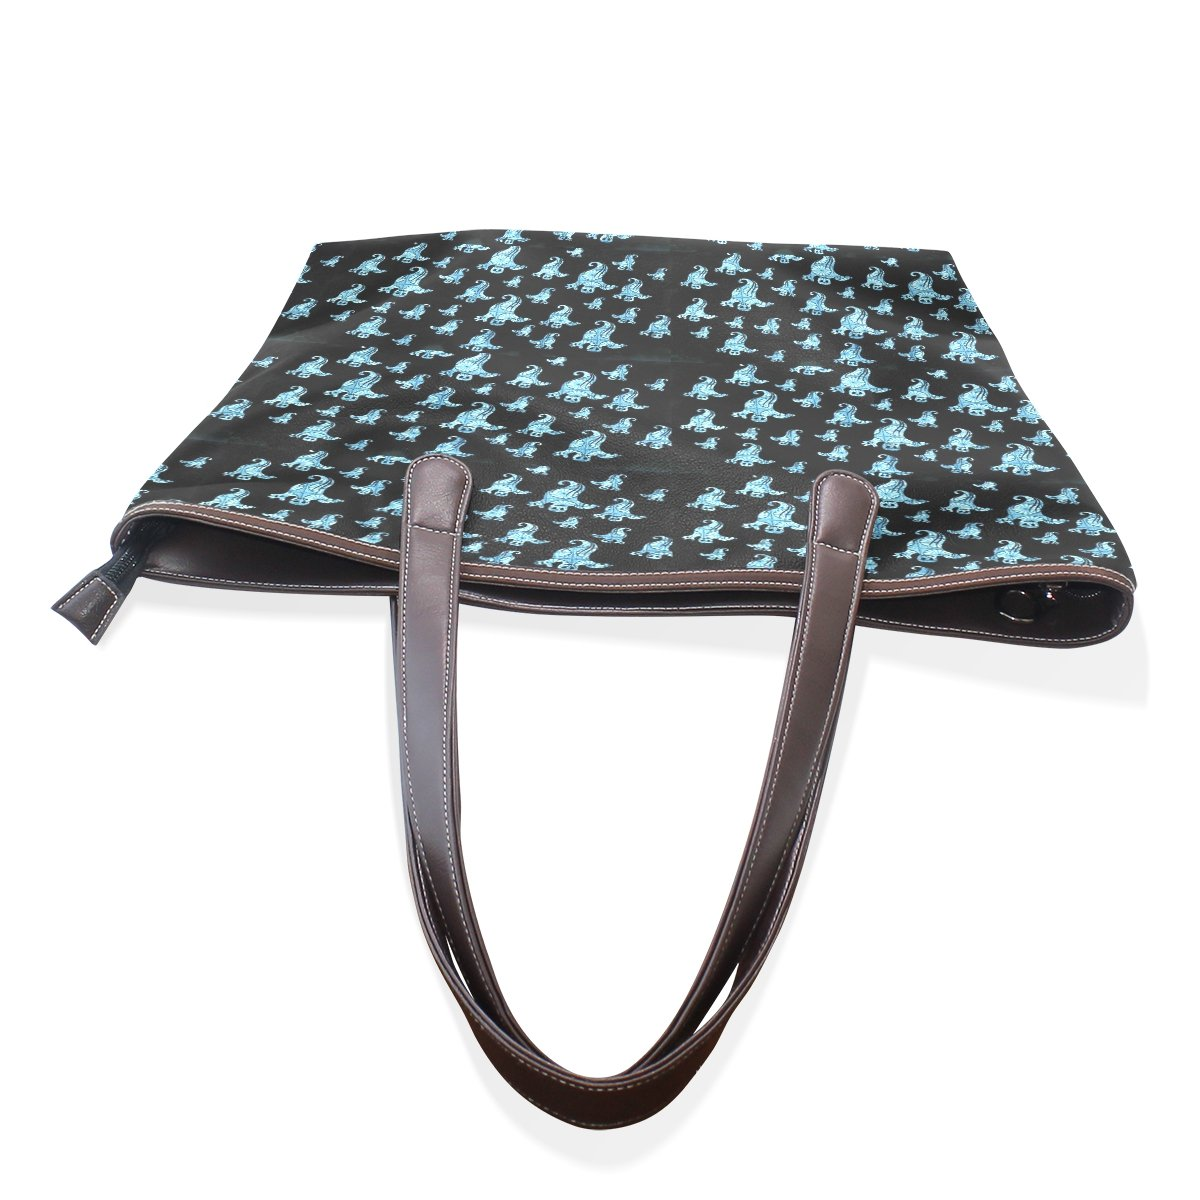 Ye Store Christmas Ghost Lady PU Leather Handbag Tote Bag Shoulder Bag Shopping Bag For